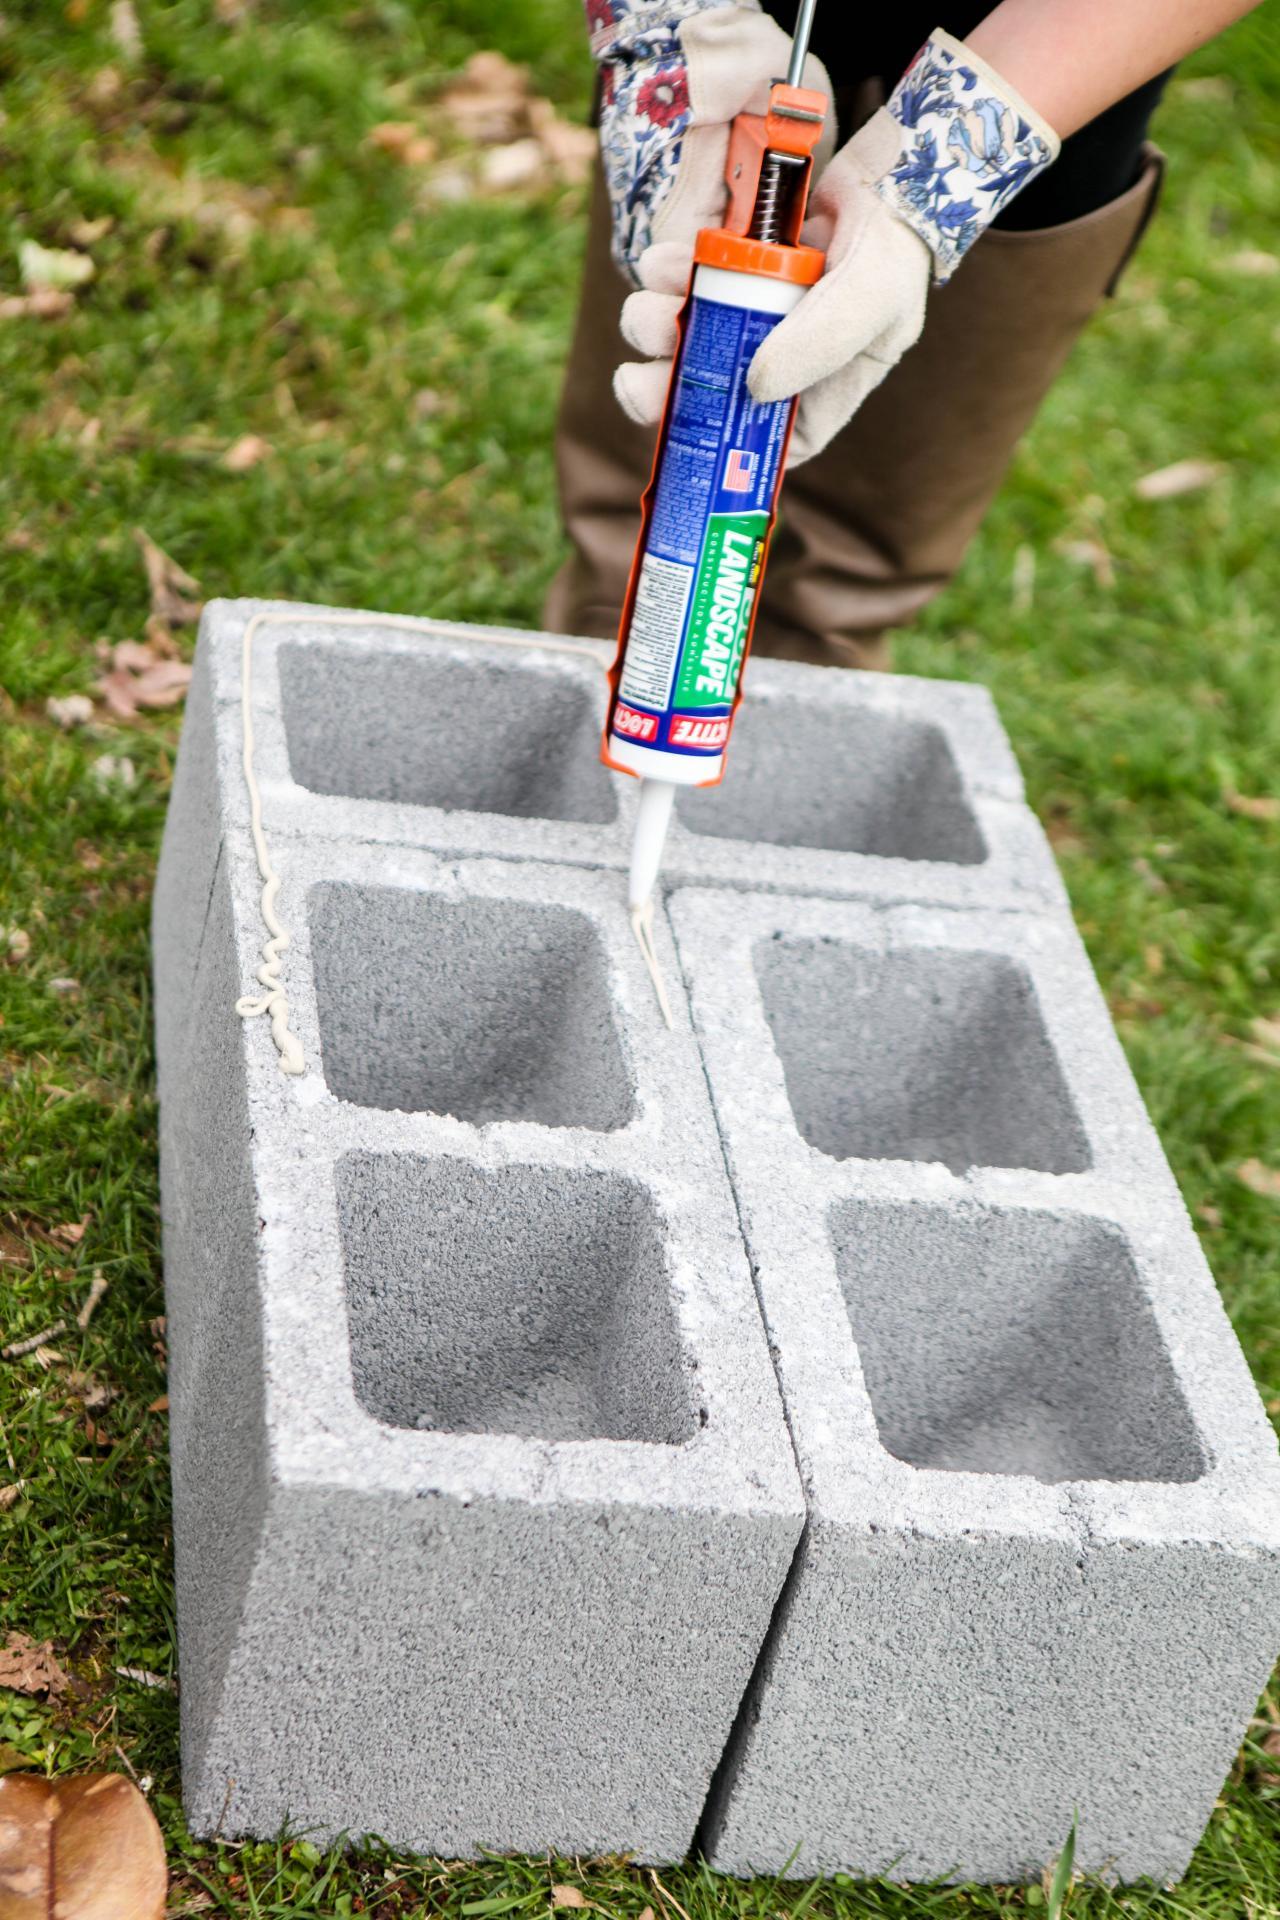 How To Make A Cinderblock Bar And Planter Hgtv S